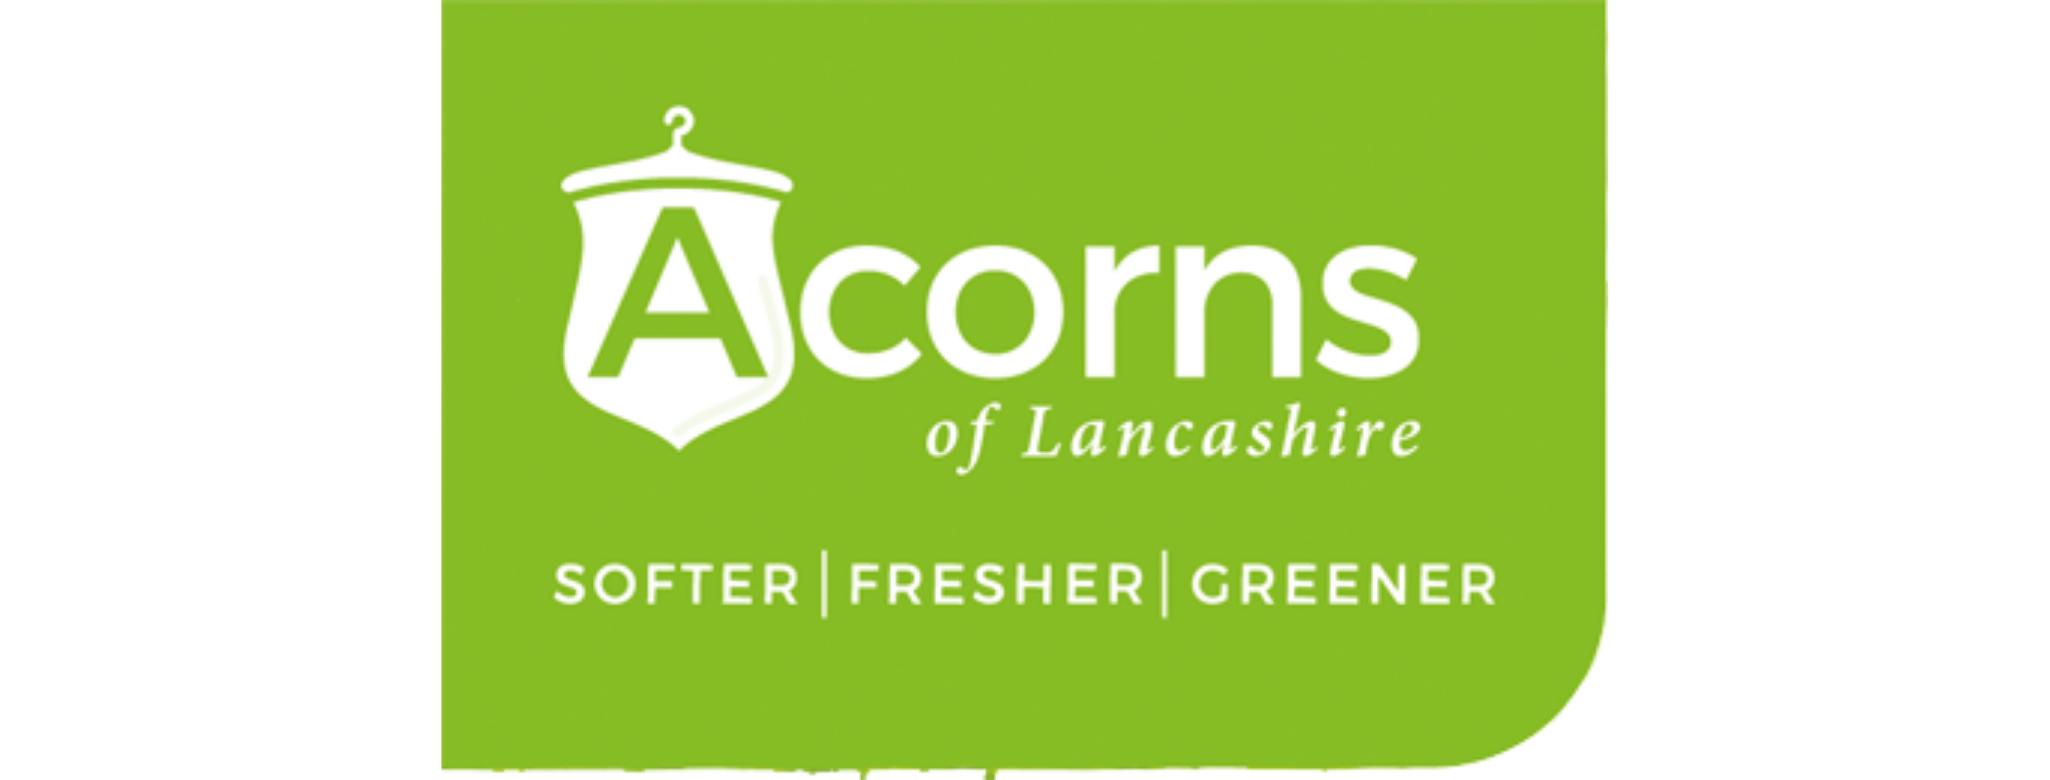 Acorns of Lancashire